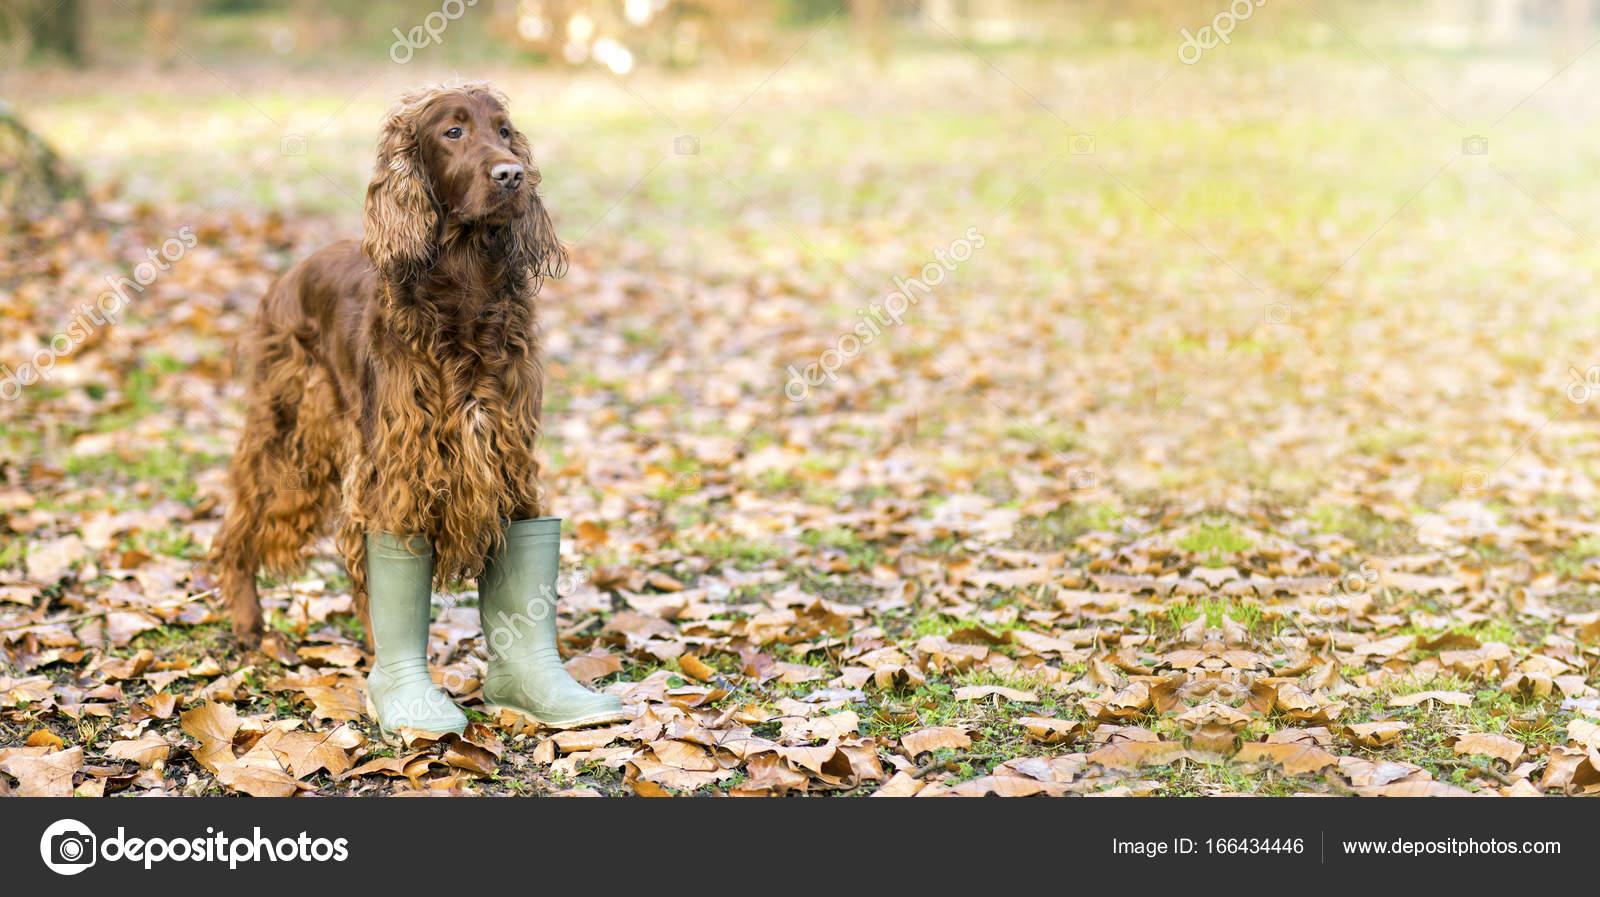 29a003e4e6e Funny dog in Autumn — Stock Photo © marenka1 #166434446